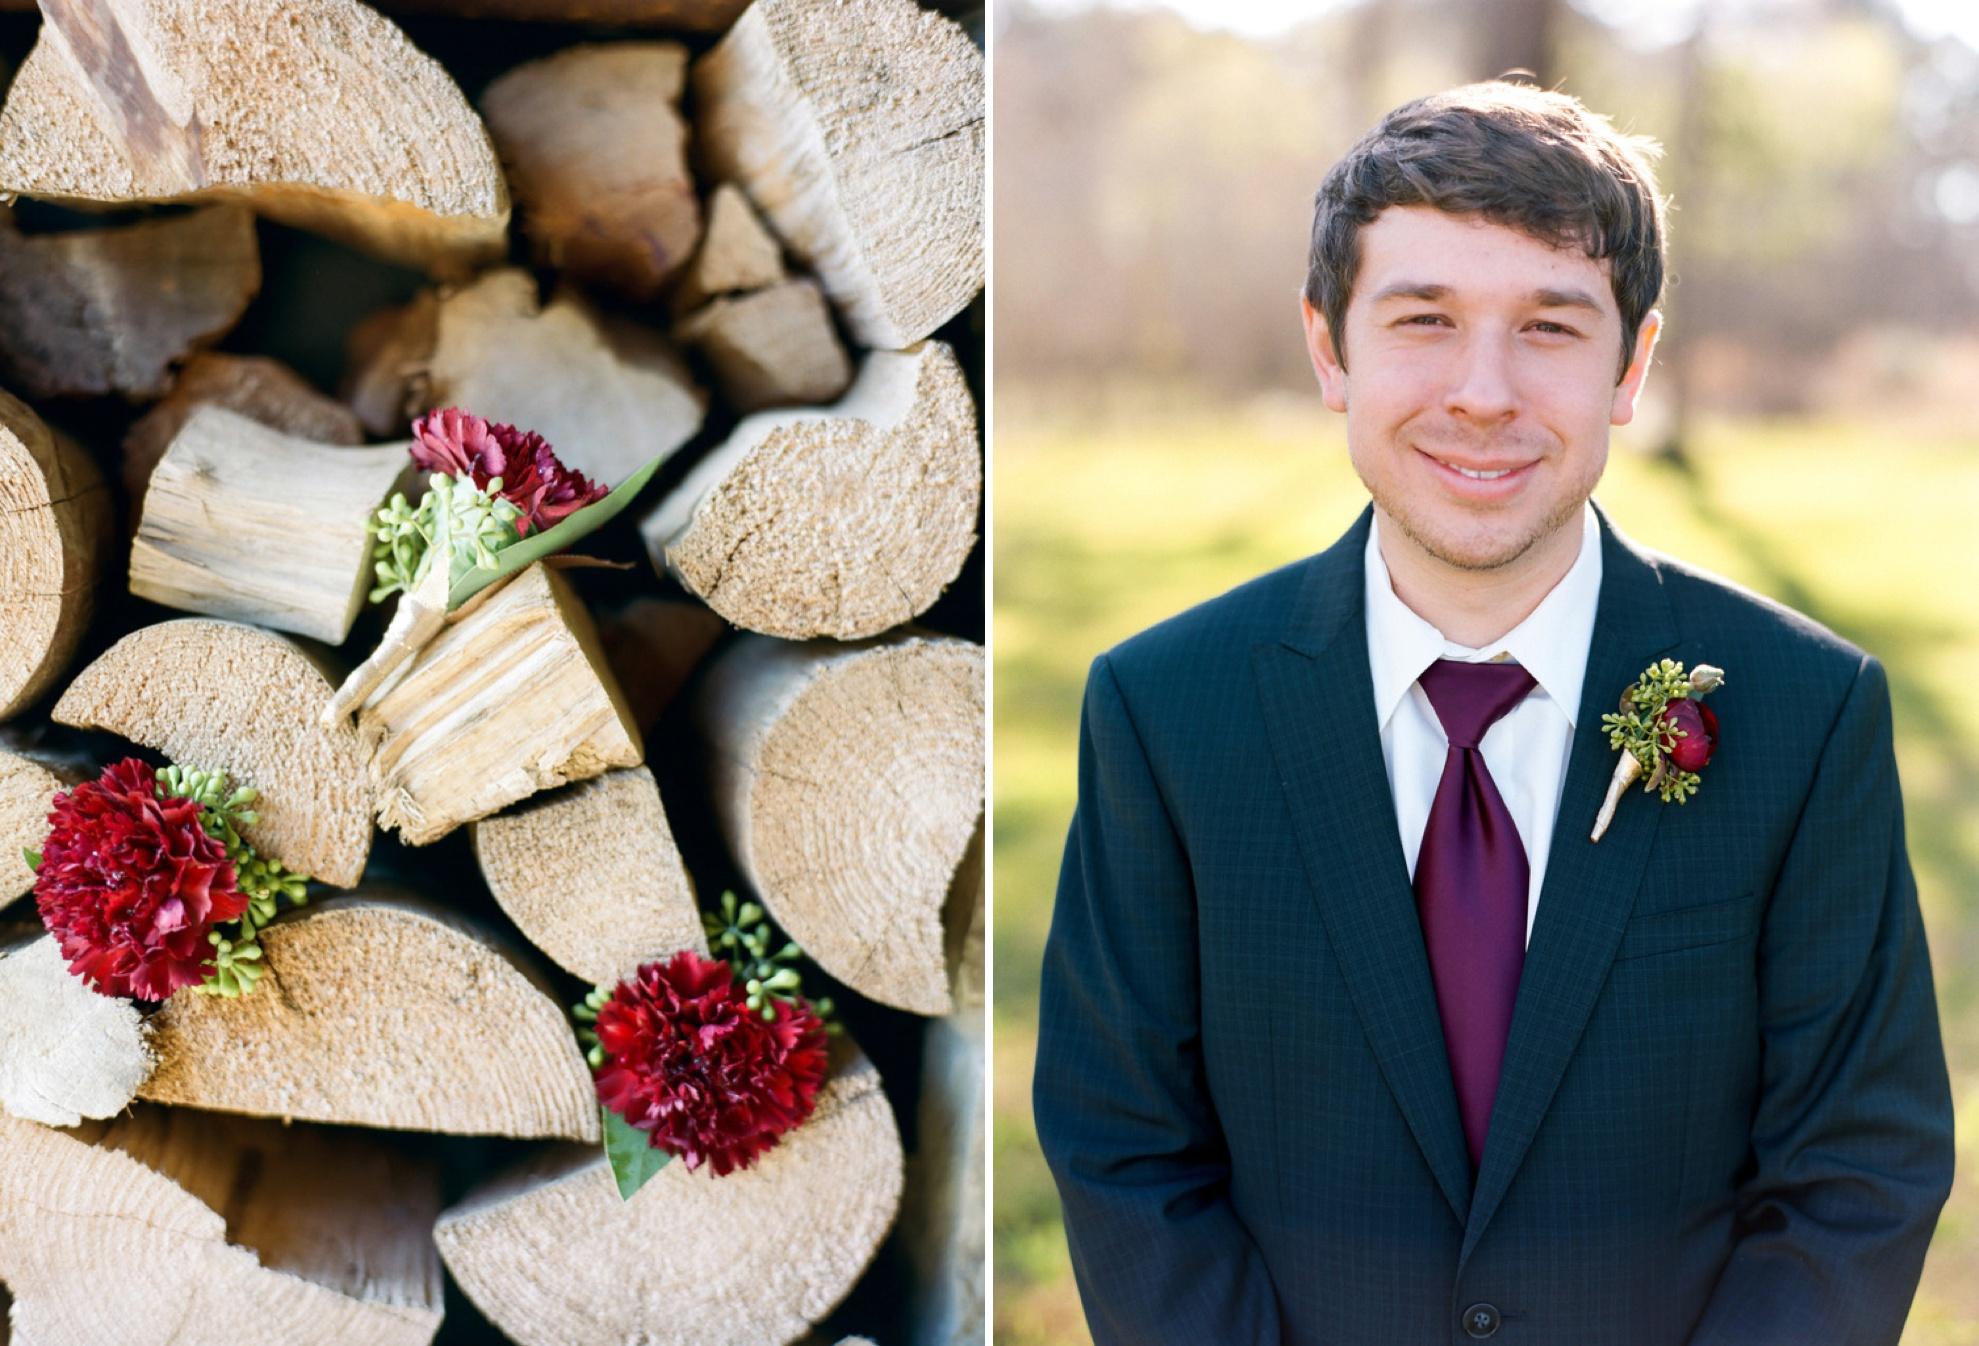 Tuscan-Courtyard-Wedding-Venue-Texas-City-Ceremony-Reception-Photographer-Dana-Fernandez-Photography.jpg